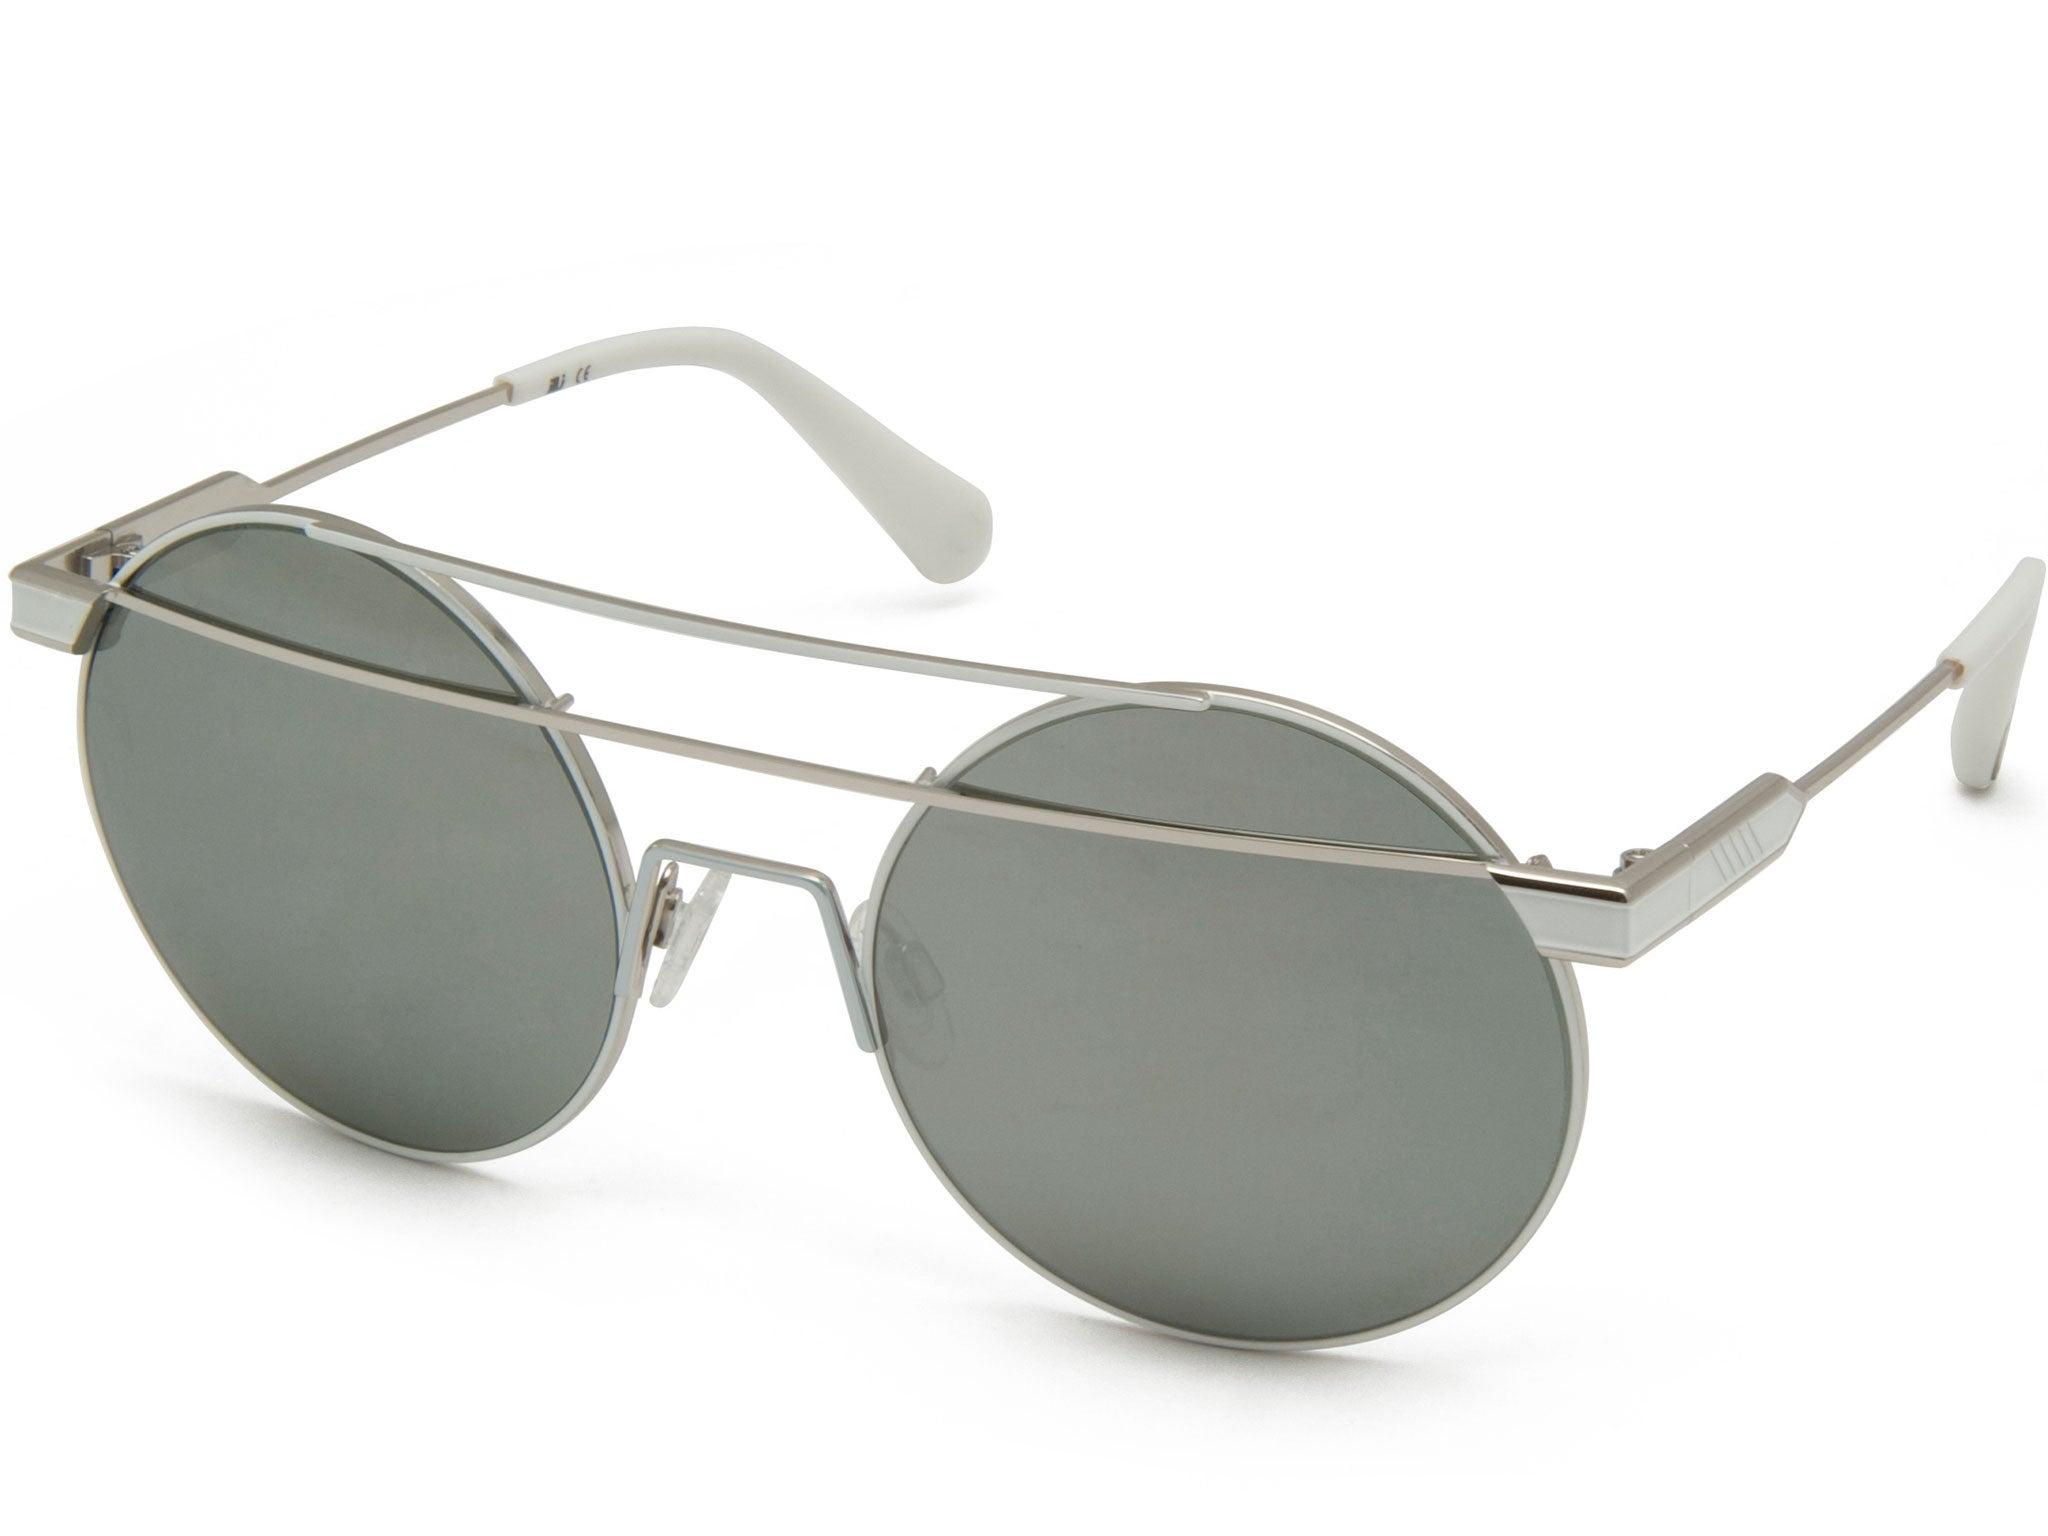 de837545ee Will.i.am launches eyewear collection ill.i Optics